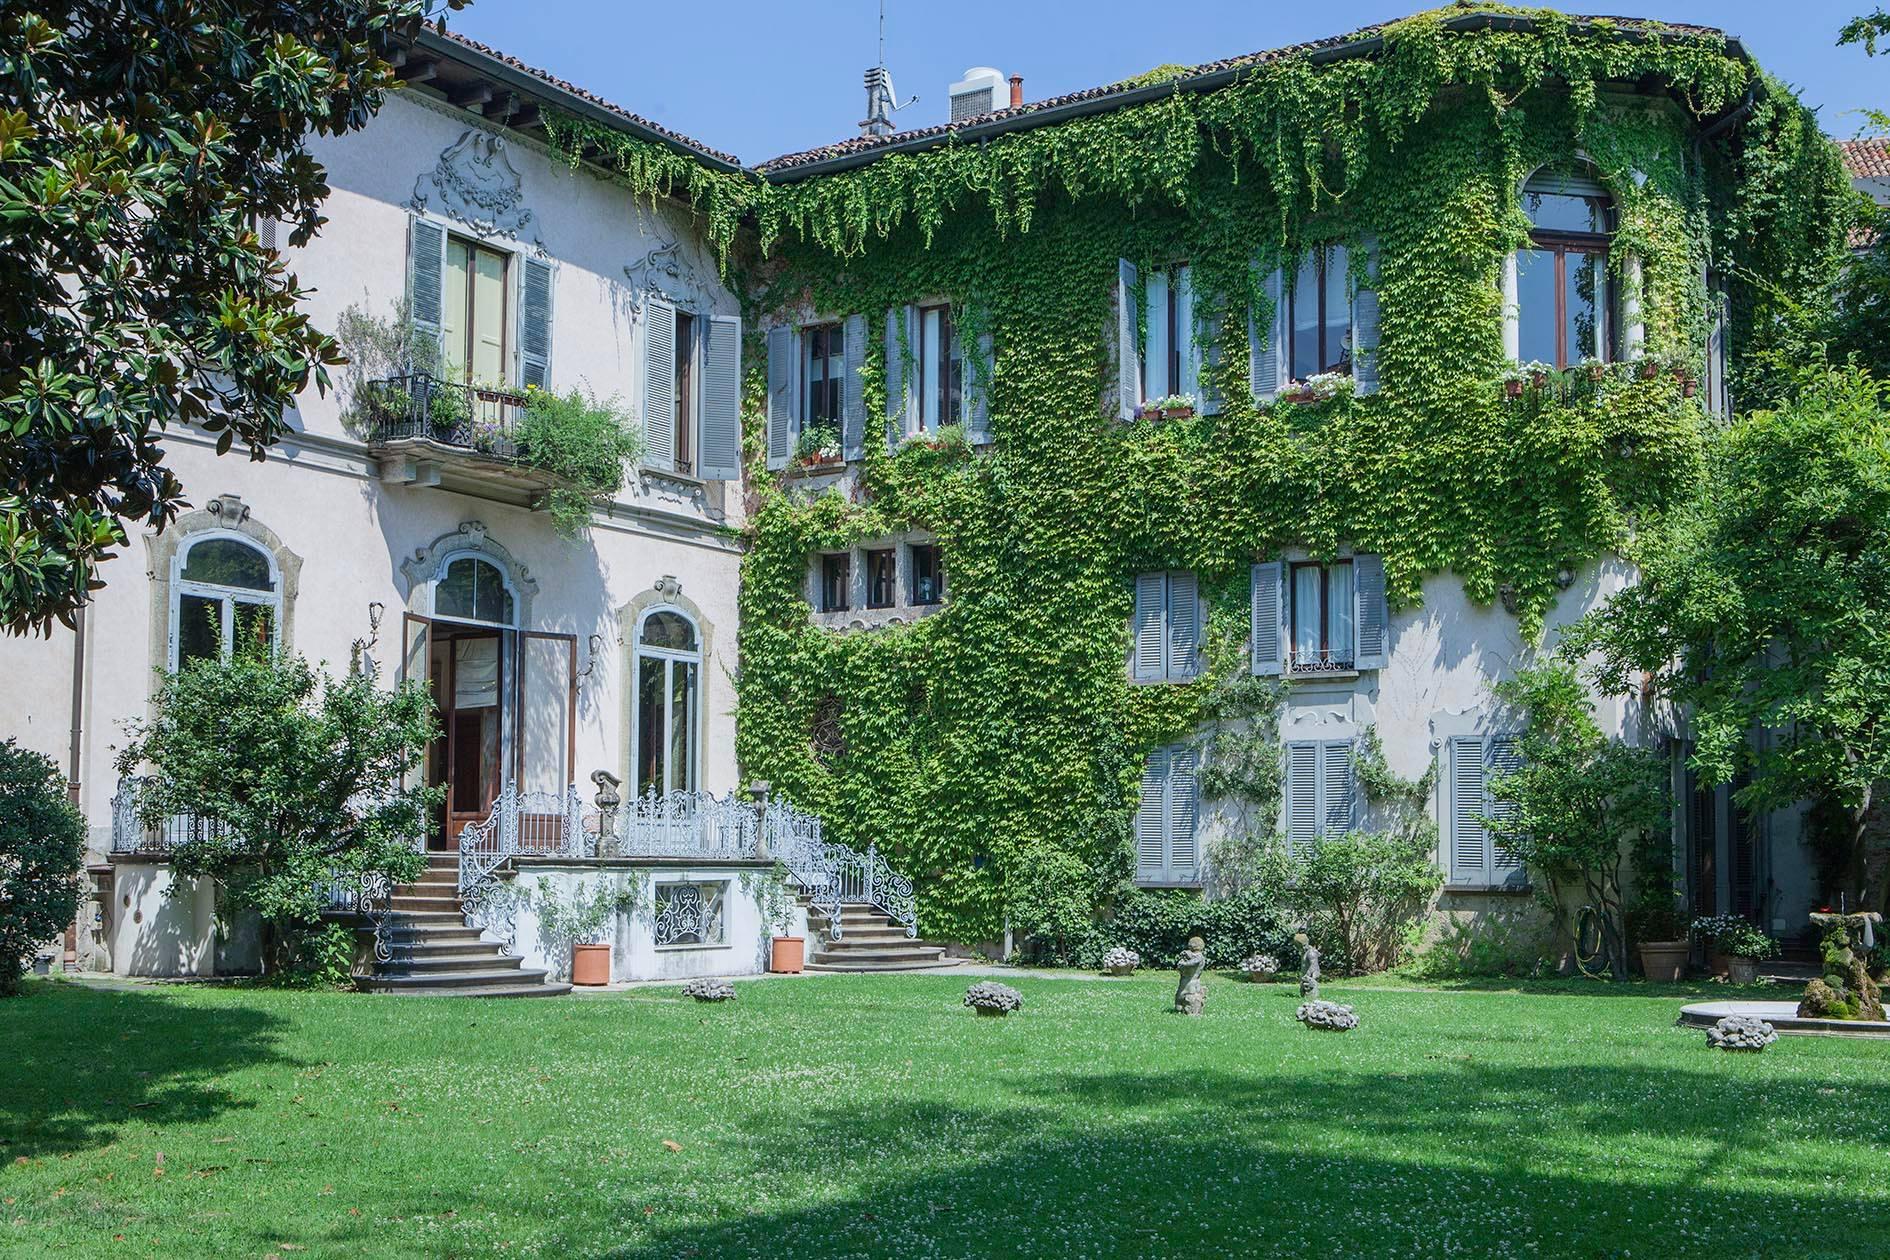 Al cinema leonardo da vinci il genio a milano milano italia - Giardino interno casa ...